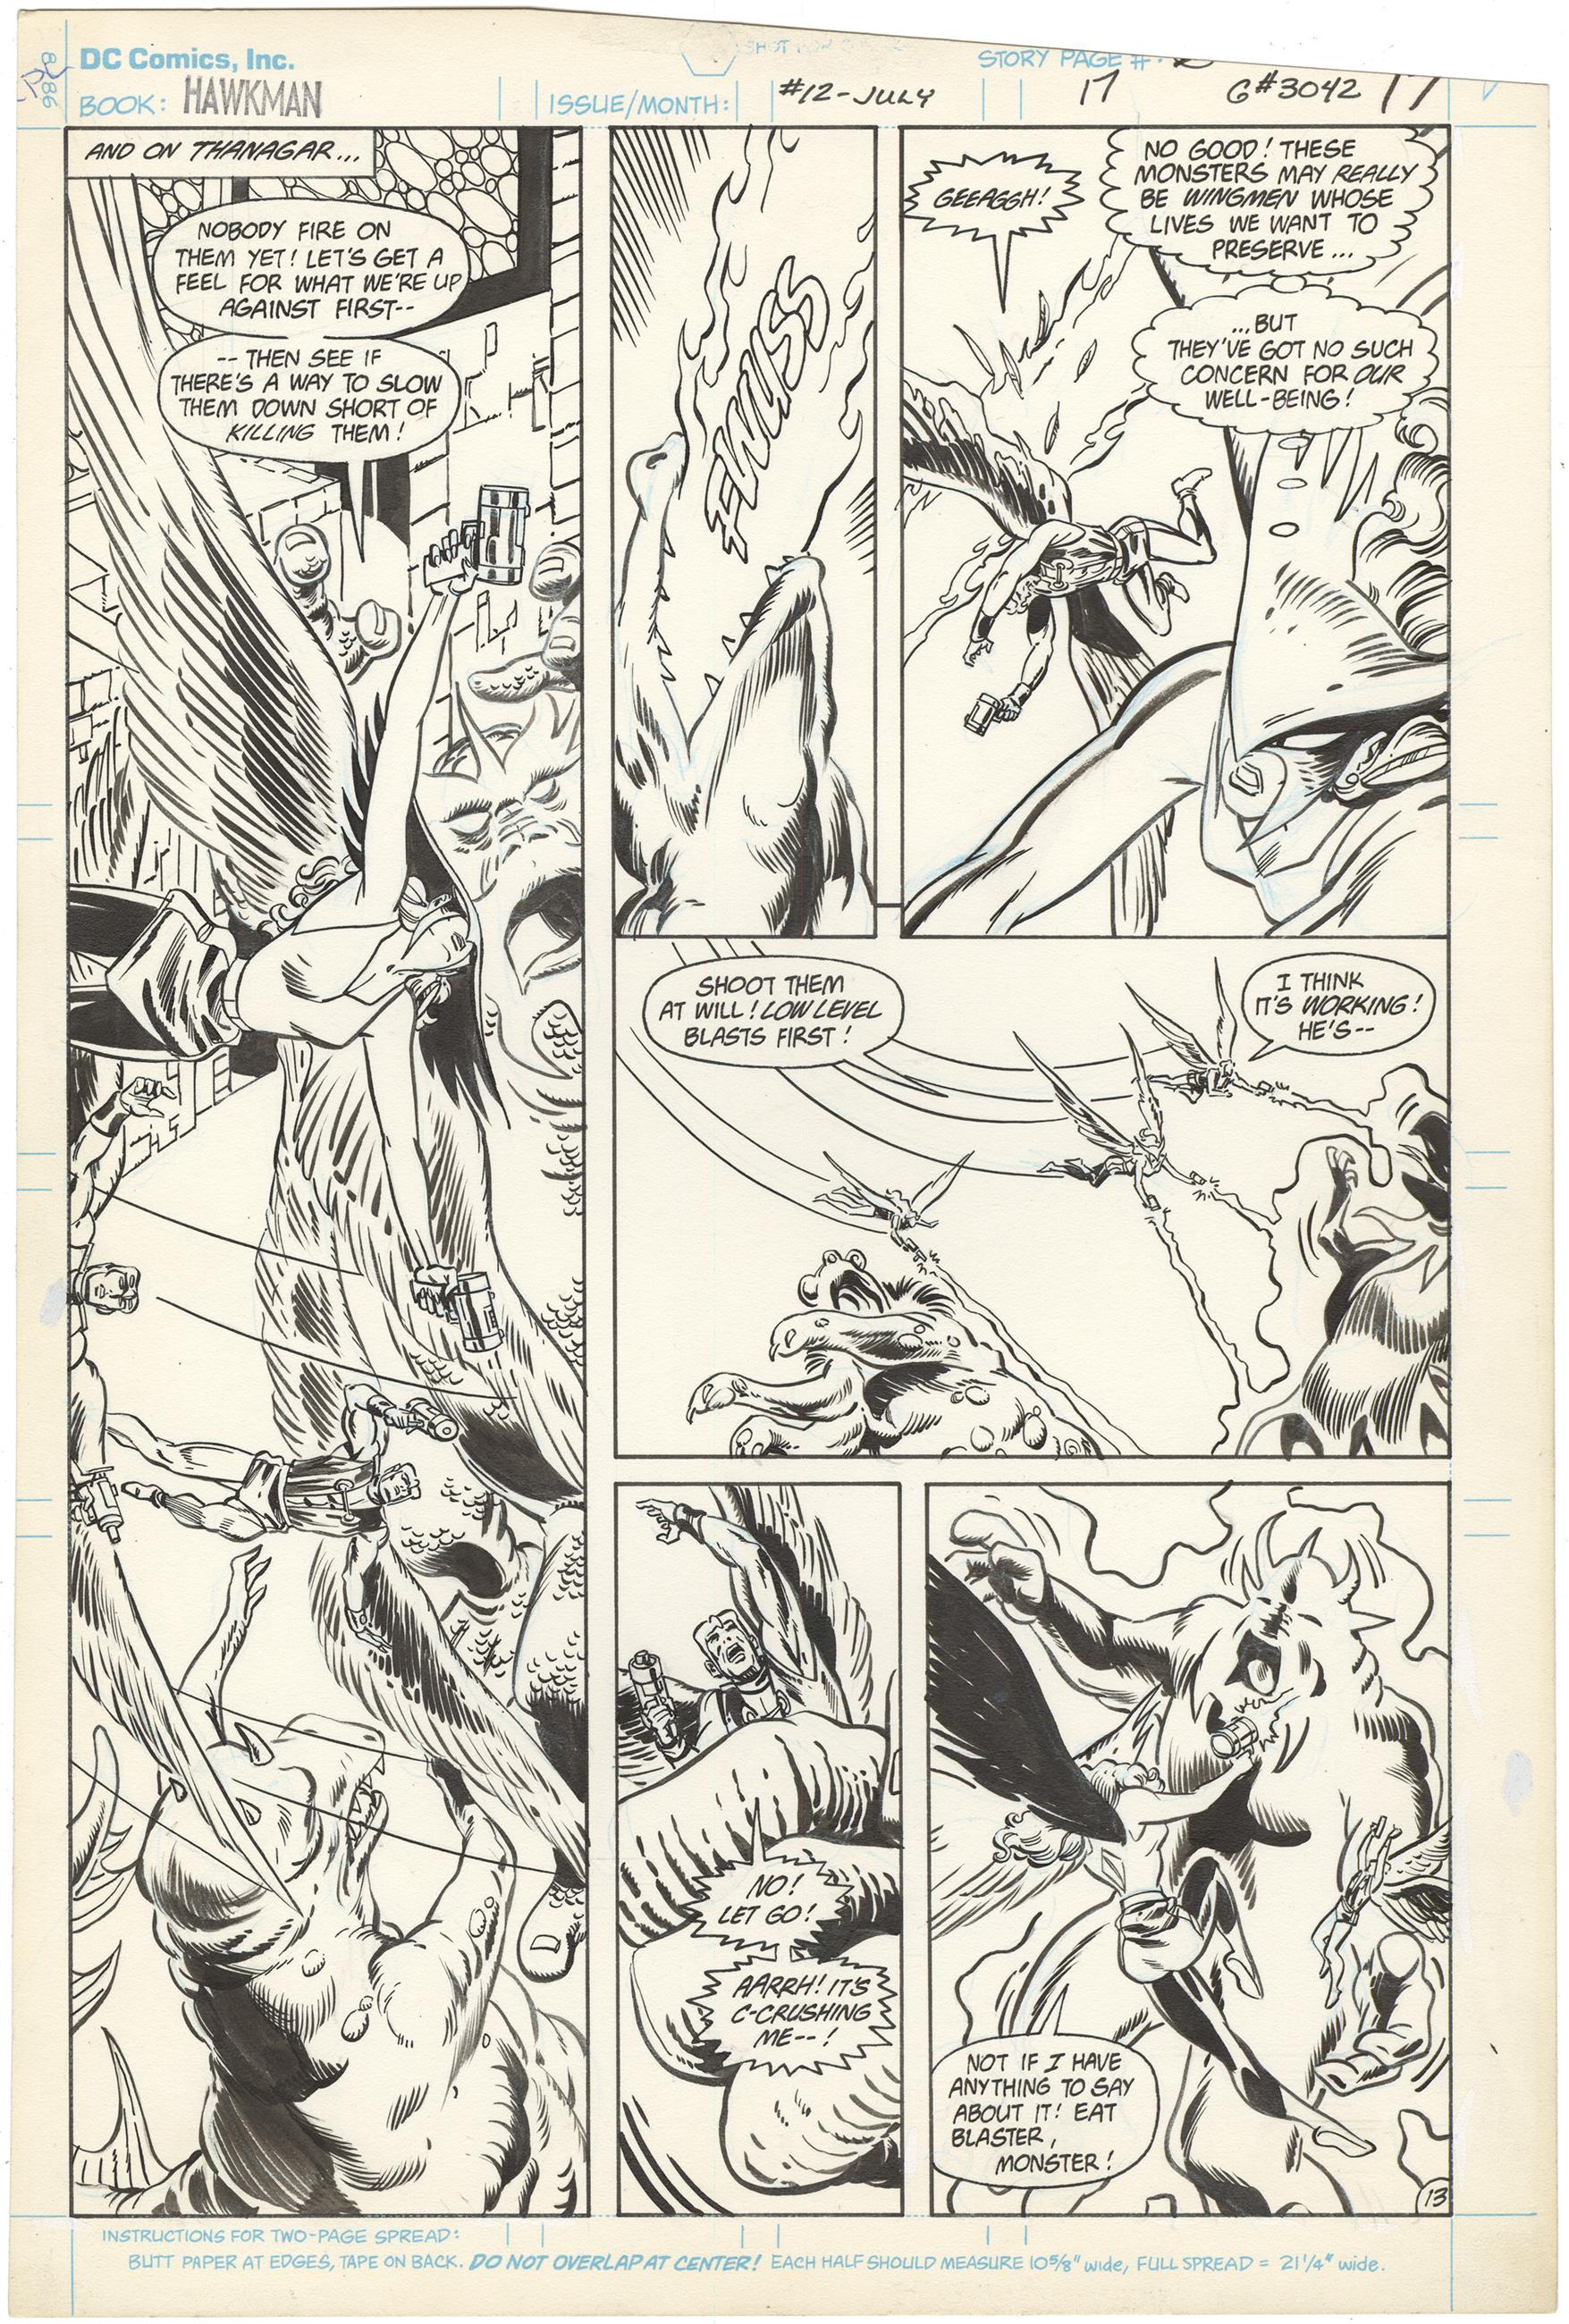 Hawkman #12 p13